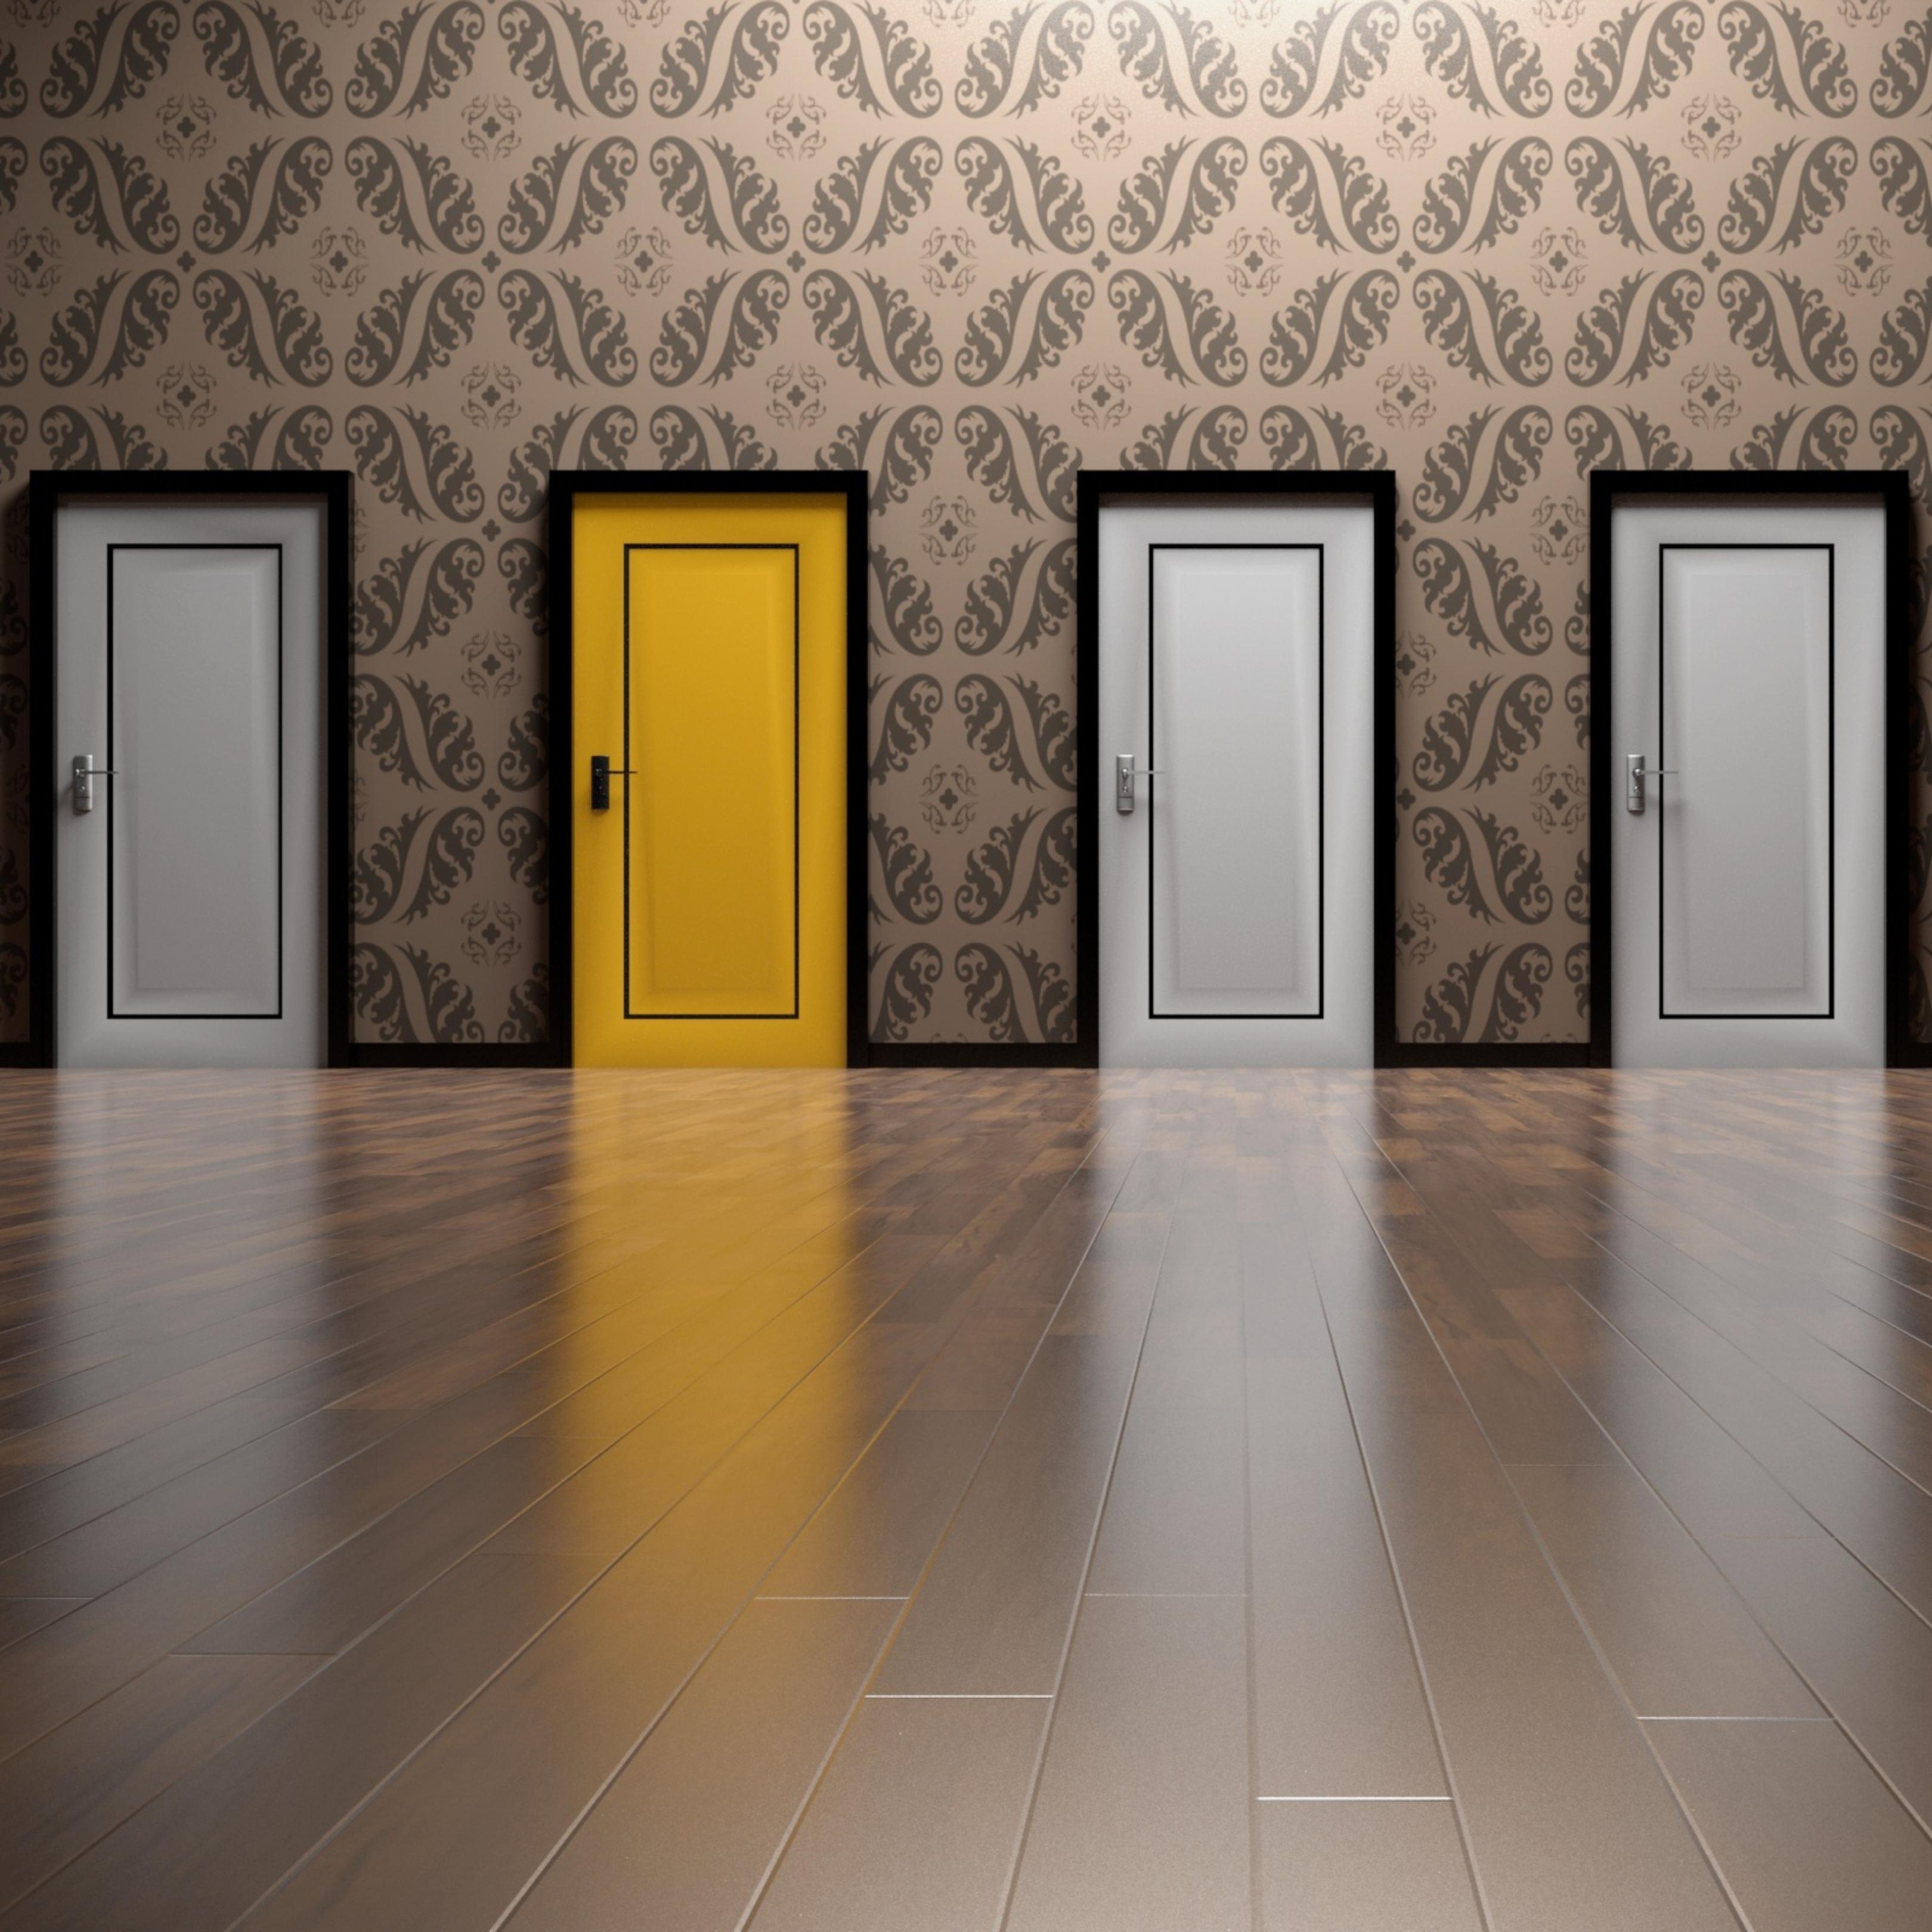 Content Ideas To Advertise On TikTok - Paradox Of Choice